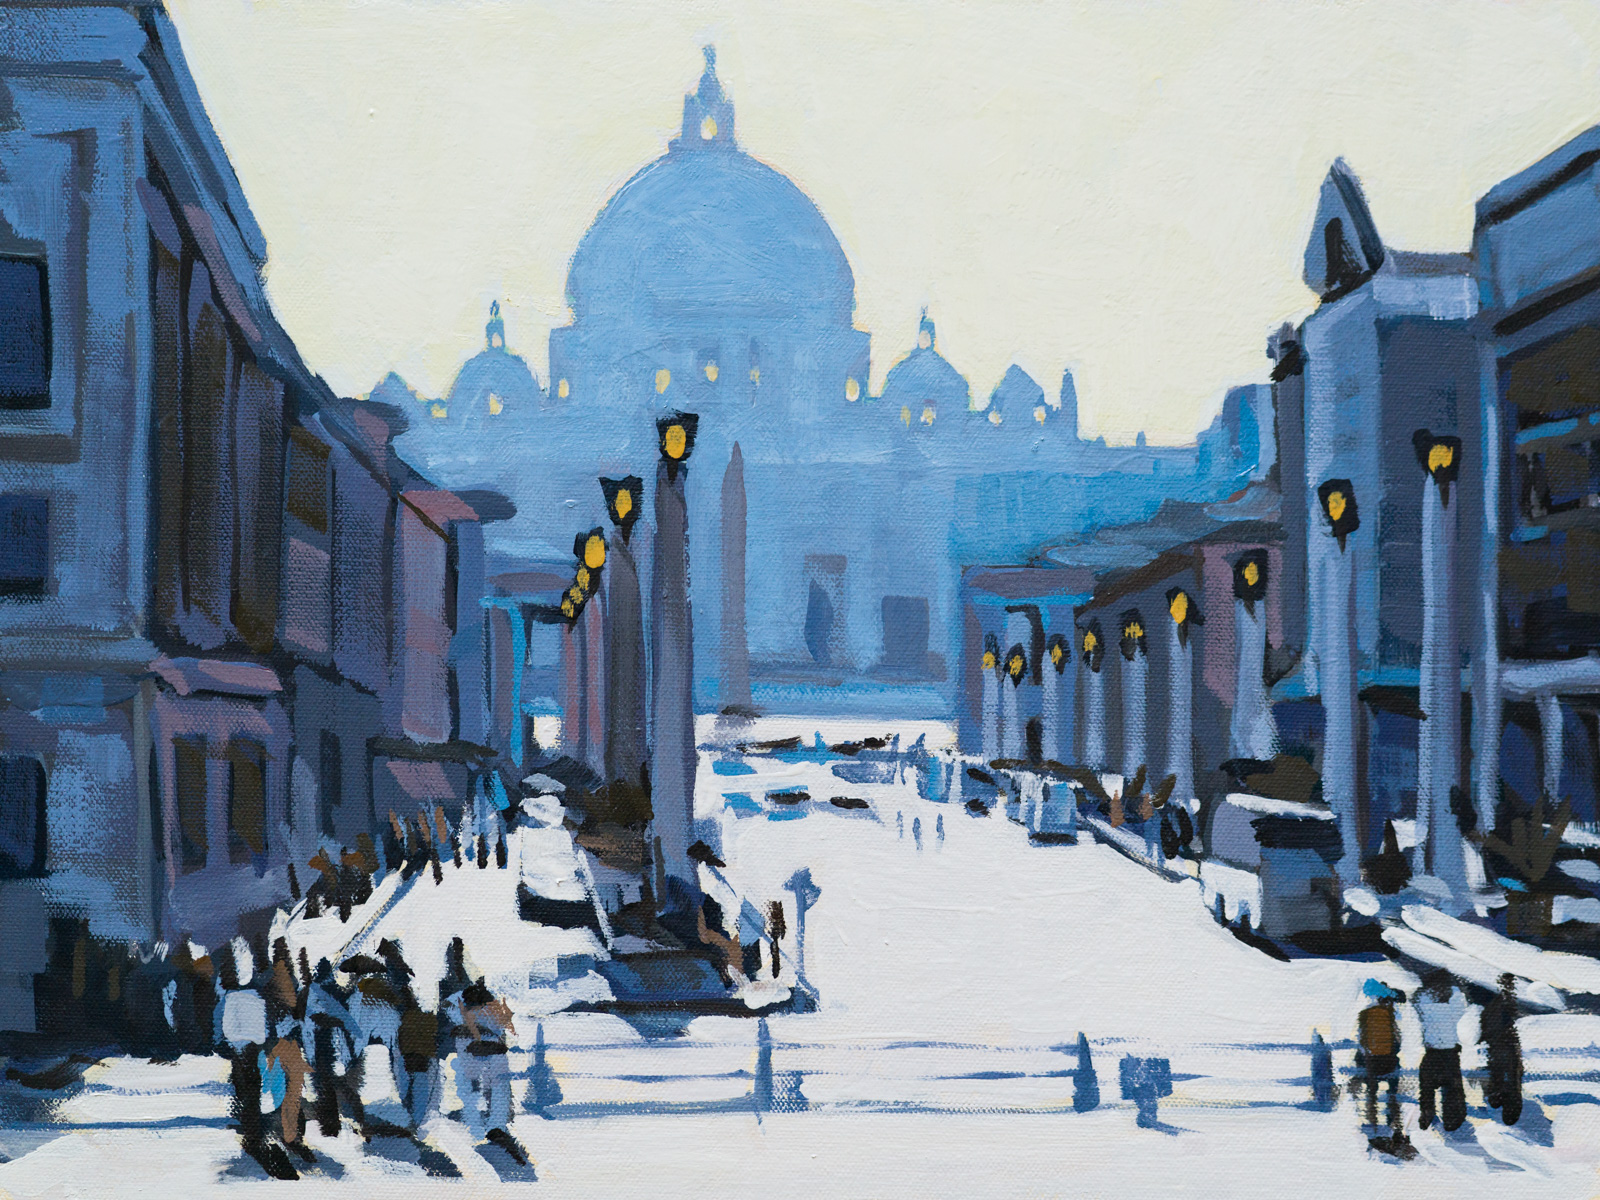 Toward Saint Peter's Square